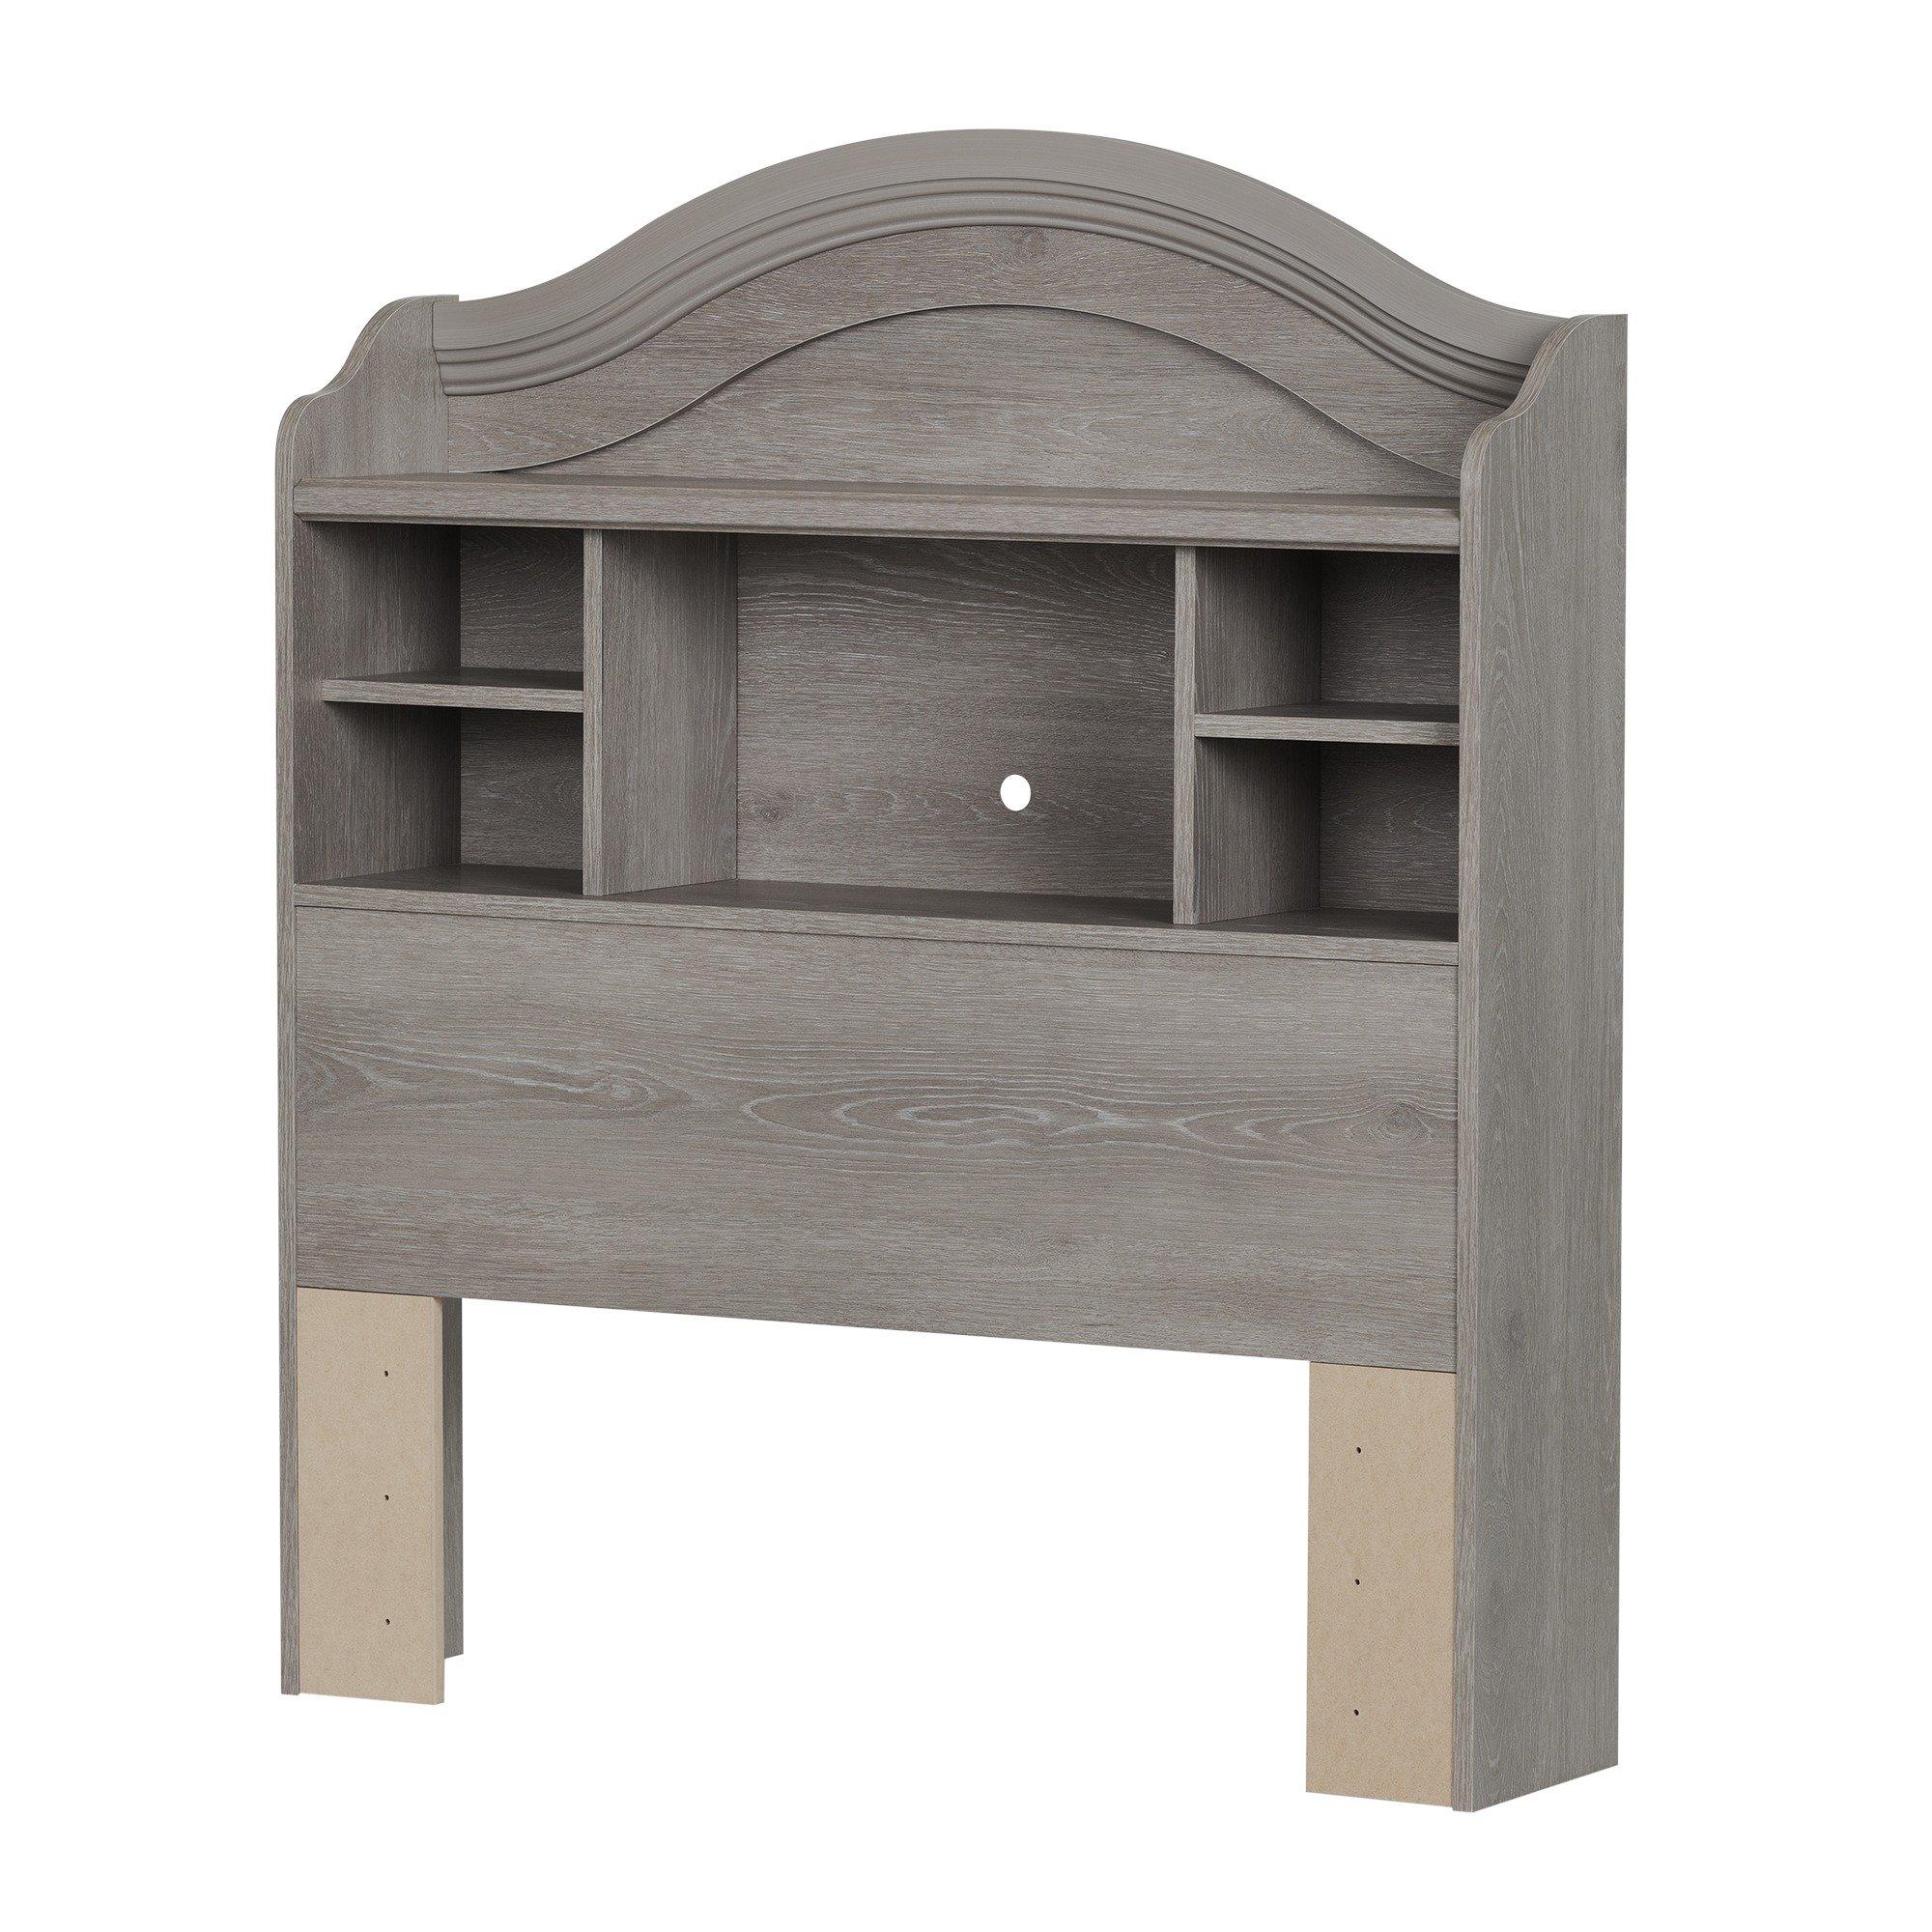 South Shore 10596 Savannah 39'' Twin Bookcase Headboard, Sand Oak by South Shore